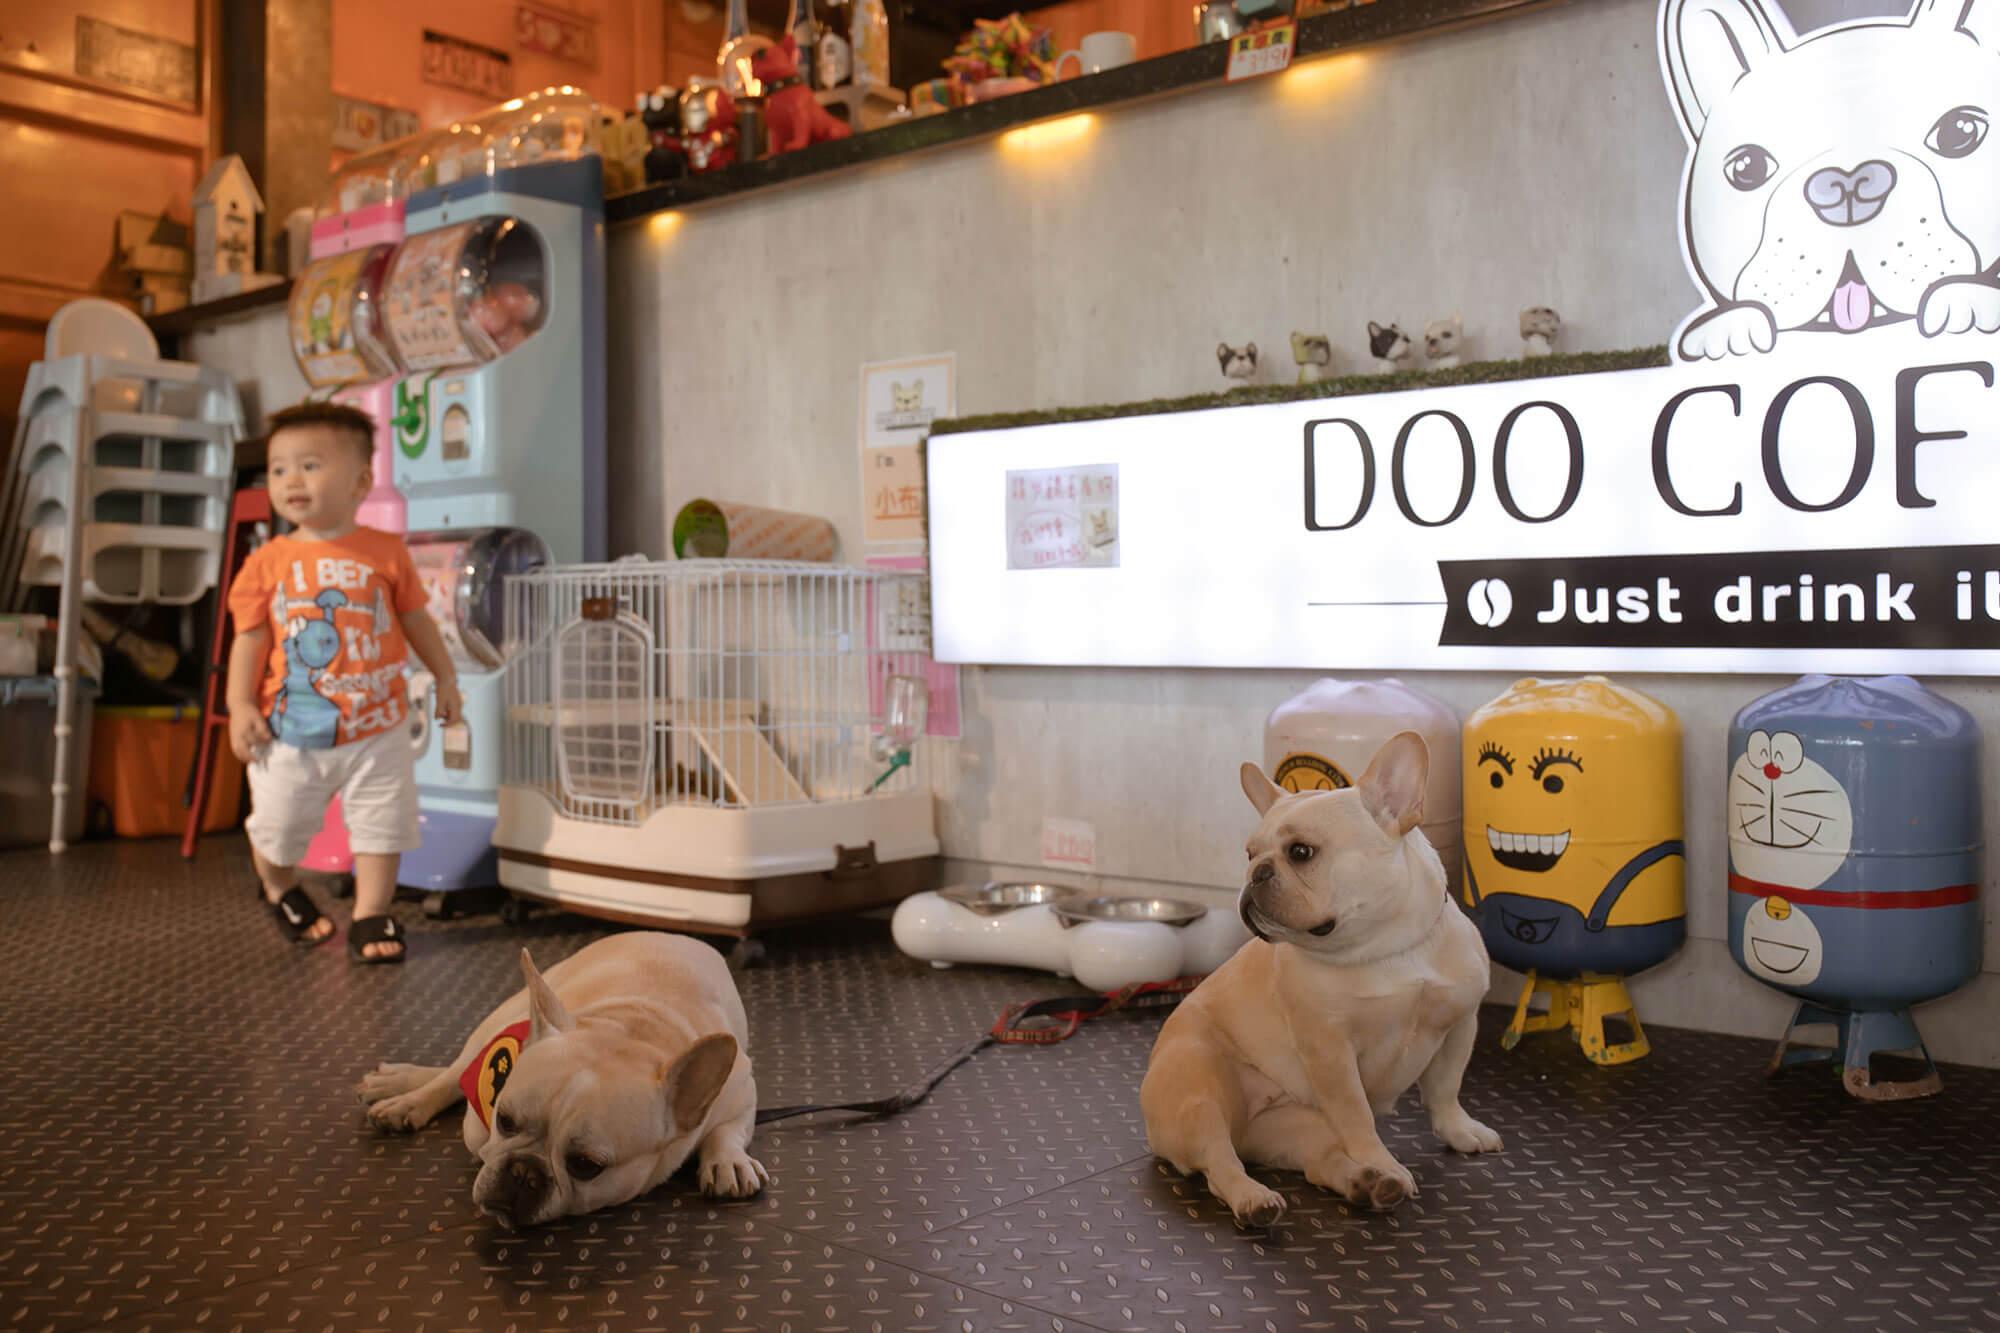 dog coffee_店內櫃檯3